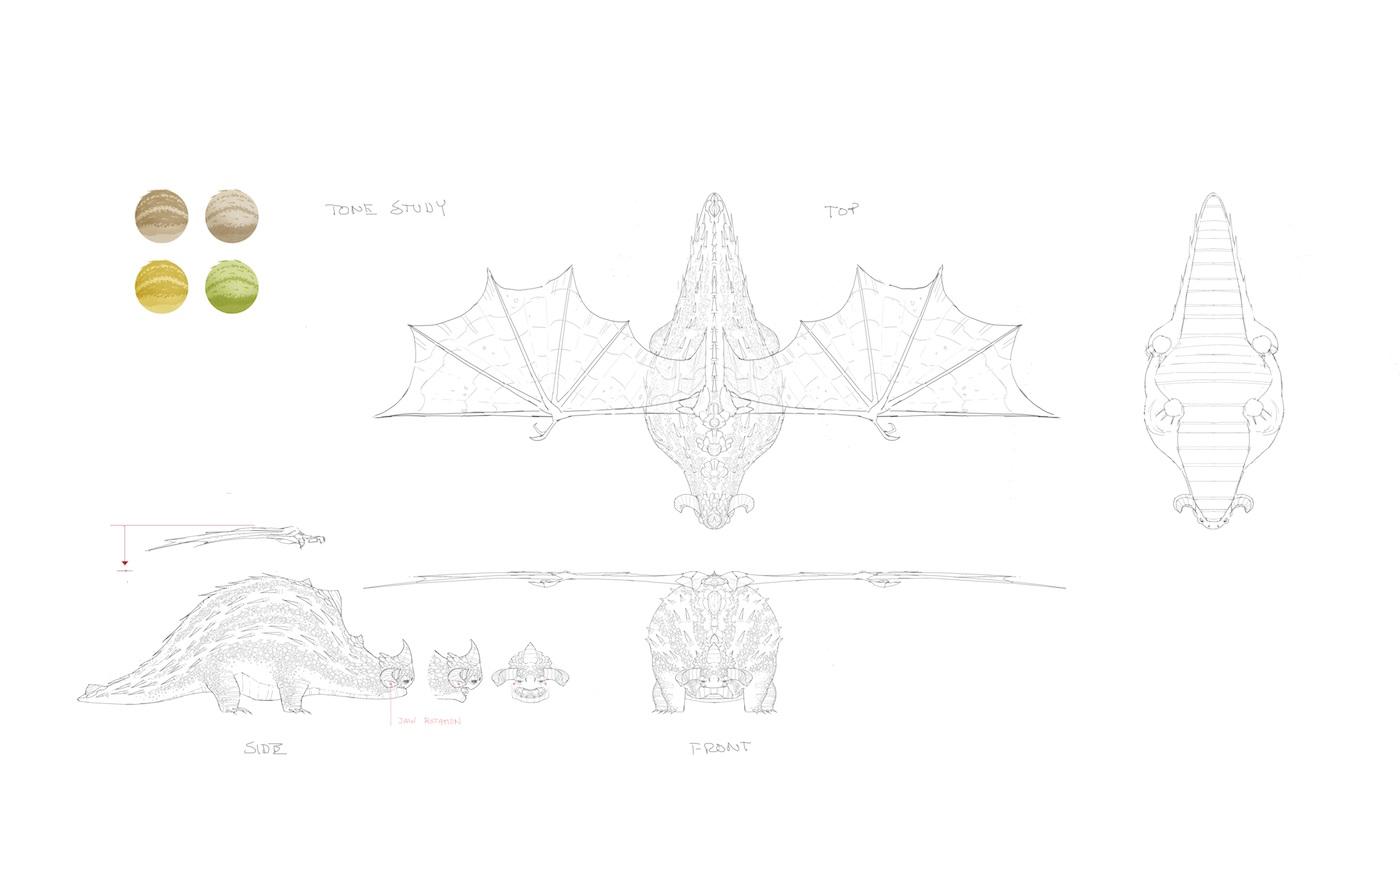 dragons-race-to-the-edge-season-3-buffalord-concept-art-1.jpg